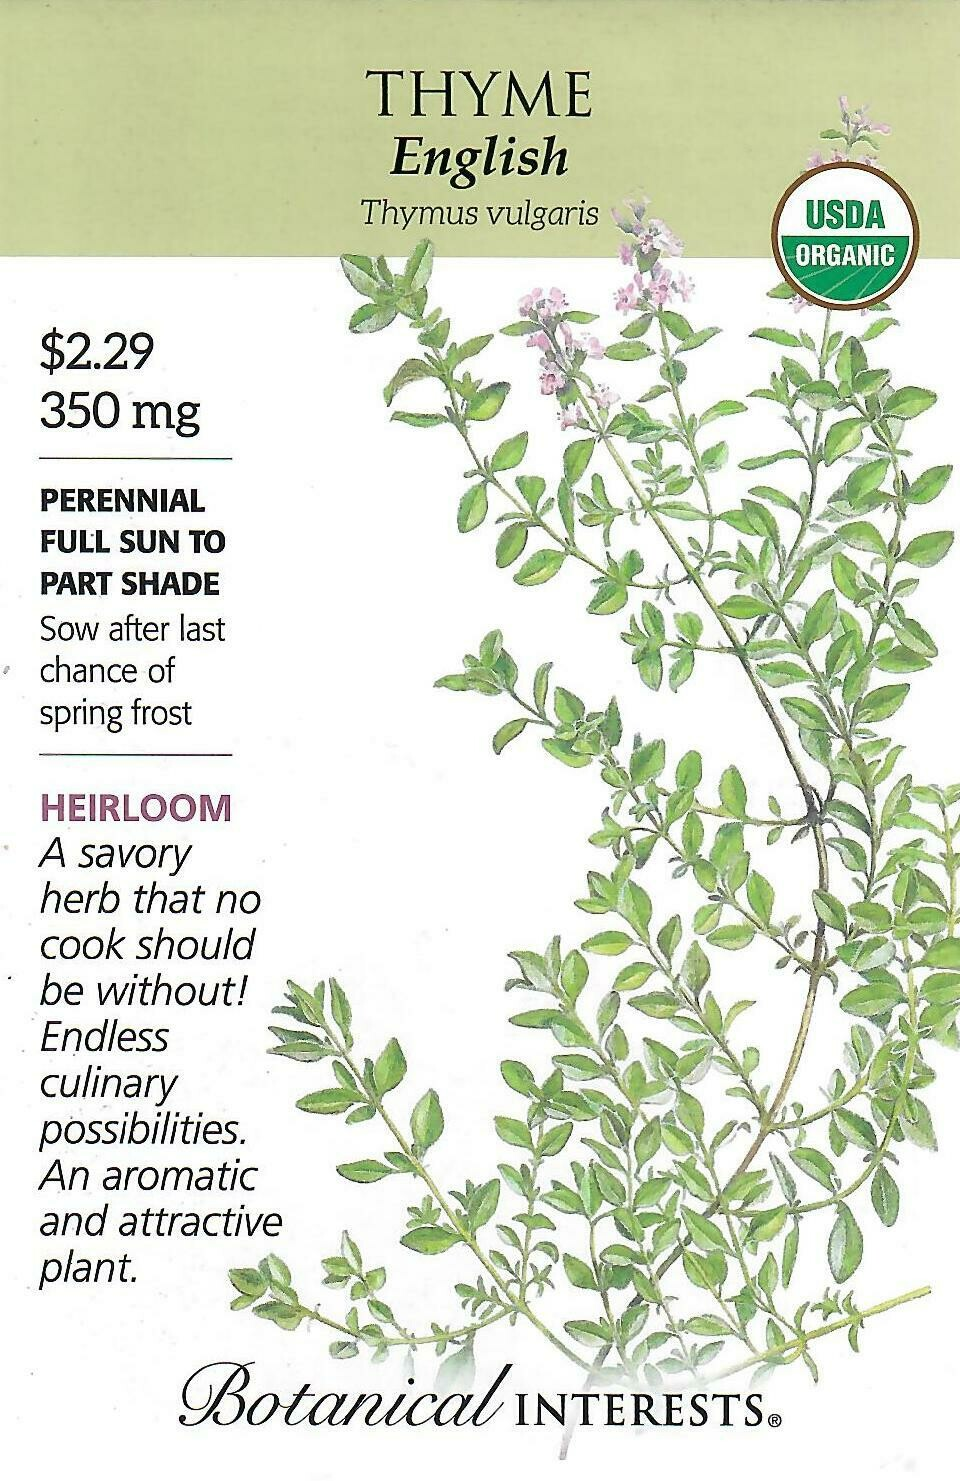 Thyme English Org Botanical Interests